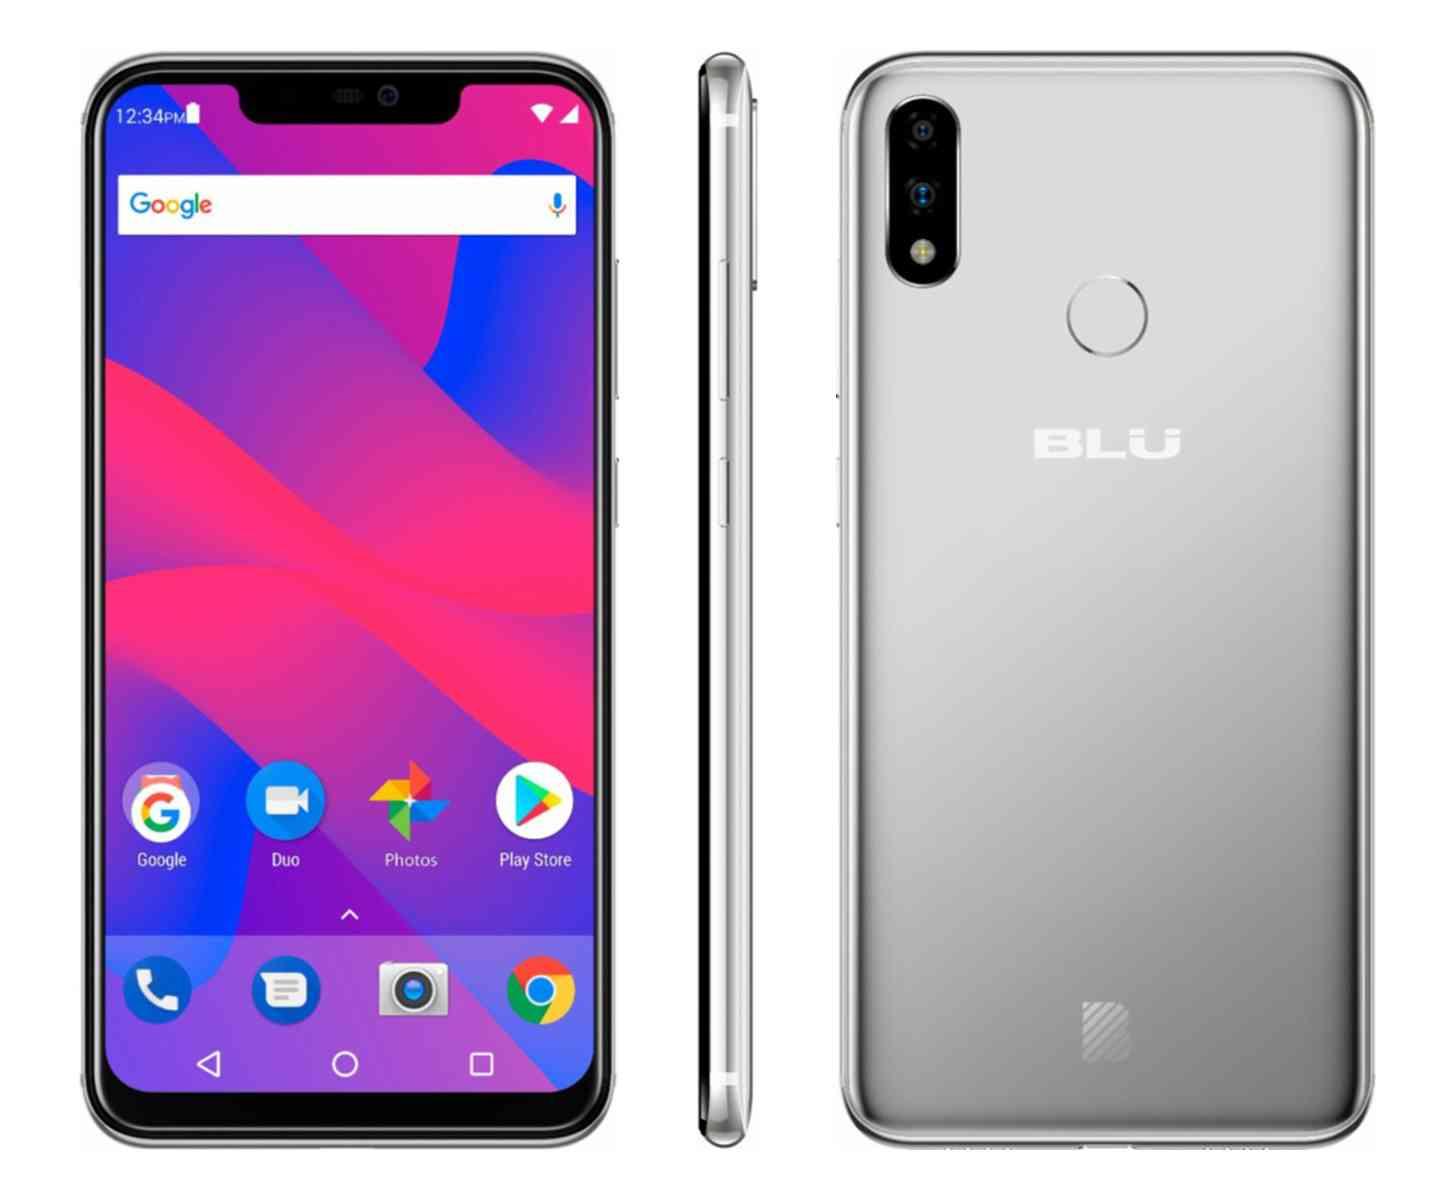 BLU announces Vivo XI and Vivo XI+ as first Verizon